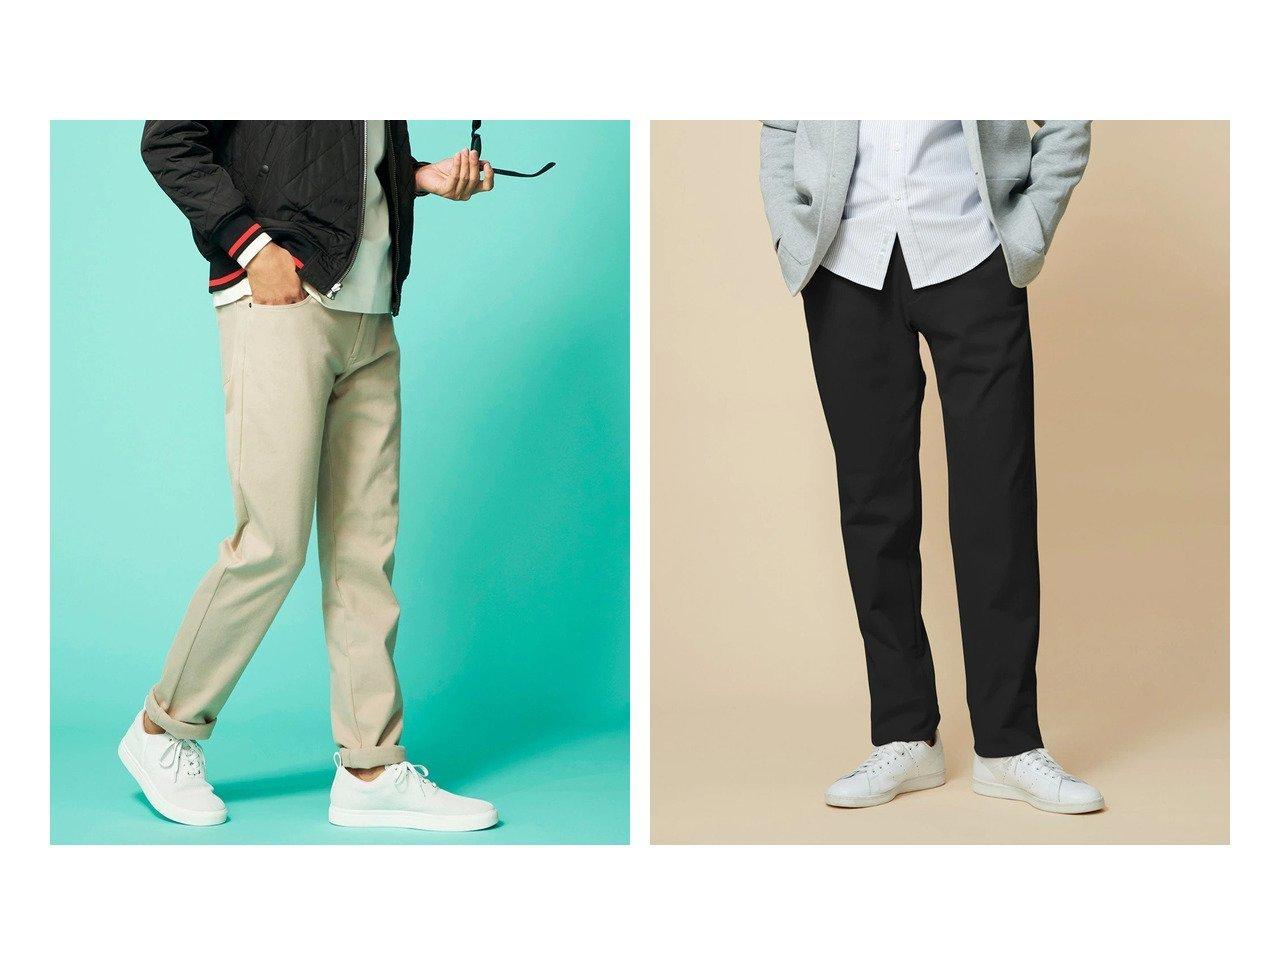 【DoCLASSE / MEN/ドゥクラッセ】の360 ストレッチ裏起毛5ポケットパンツ&360 ストレッチ裏起毛オフィサーパンツ 【MEN】ドゥクラッセの40代、50代の男性におすすめ!人気トレンド・メンズファッションの通販 おすすめで人気の流行・トレンド、ファッションの通販商品 メンズファッション・キッズファッション・インテリア・家具・レディースファッション・服の通販 founy(ファニー) https://founy.com/ ファッション Fashion メンズファッション MEN ボトムス Bottoms Men スウェット ストレッチ ポケット リラックス ワーク |ID:crp329100000021653